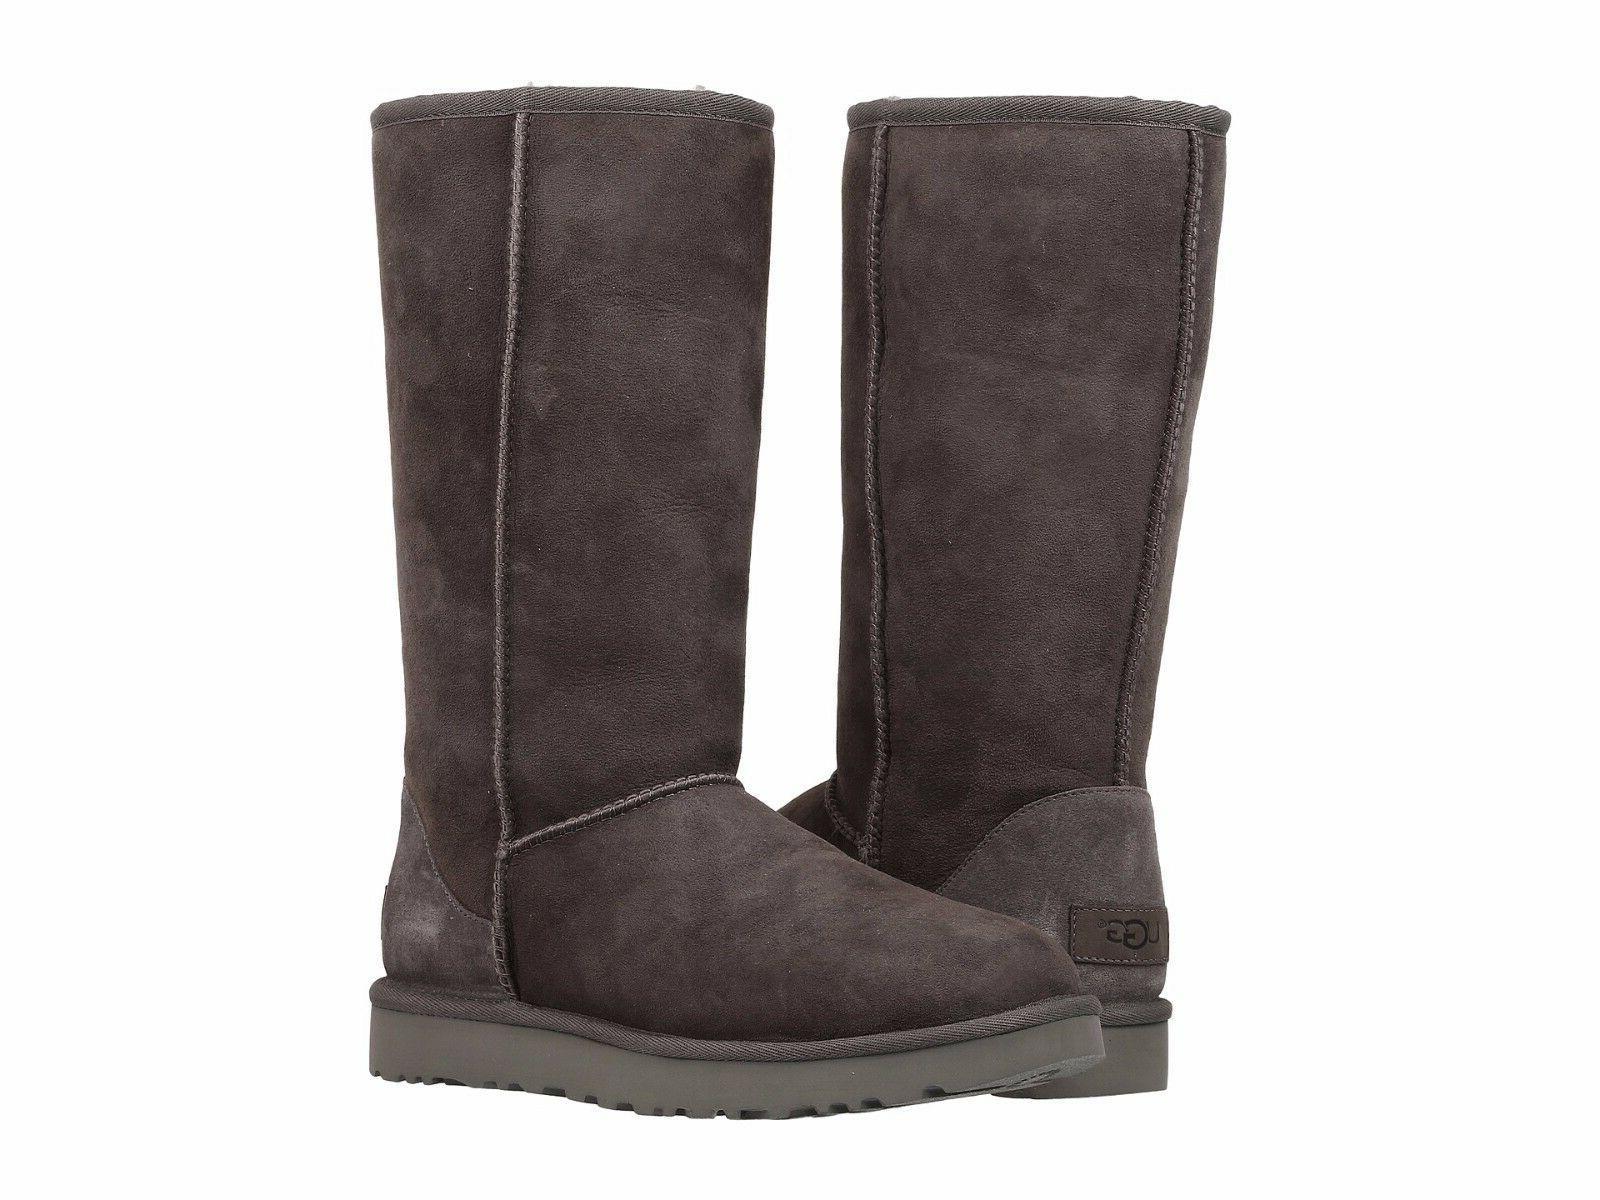 Women's Shoes UGG Classic Tall II Boots 1016224 Grey 5 6 7 8